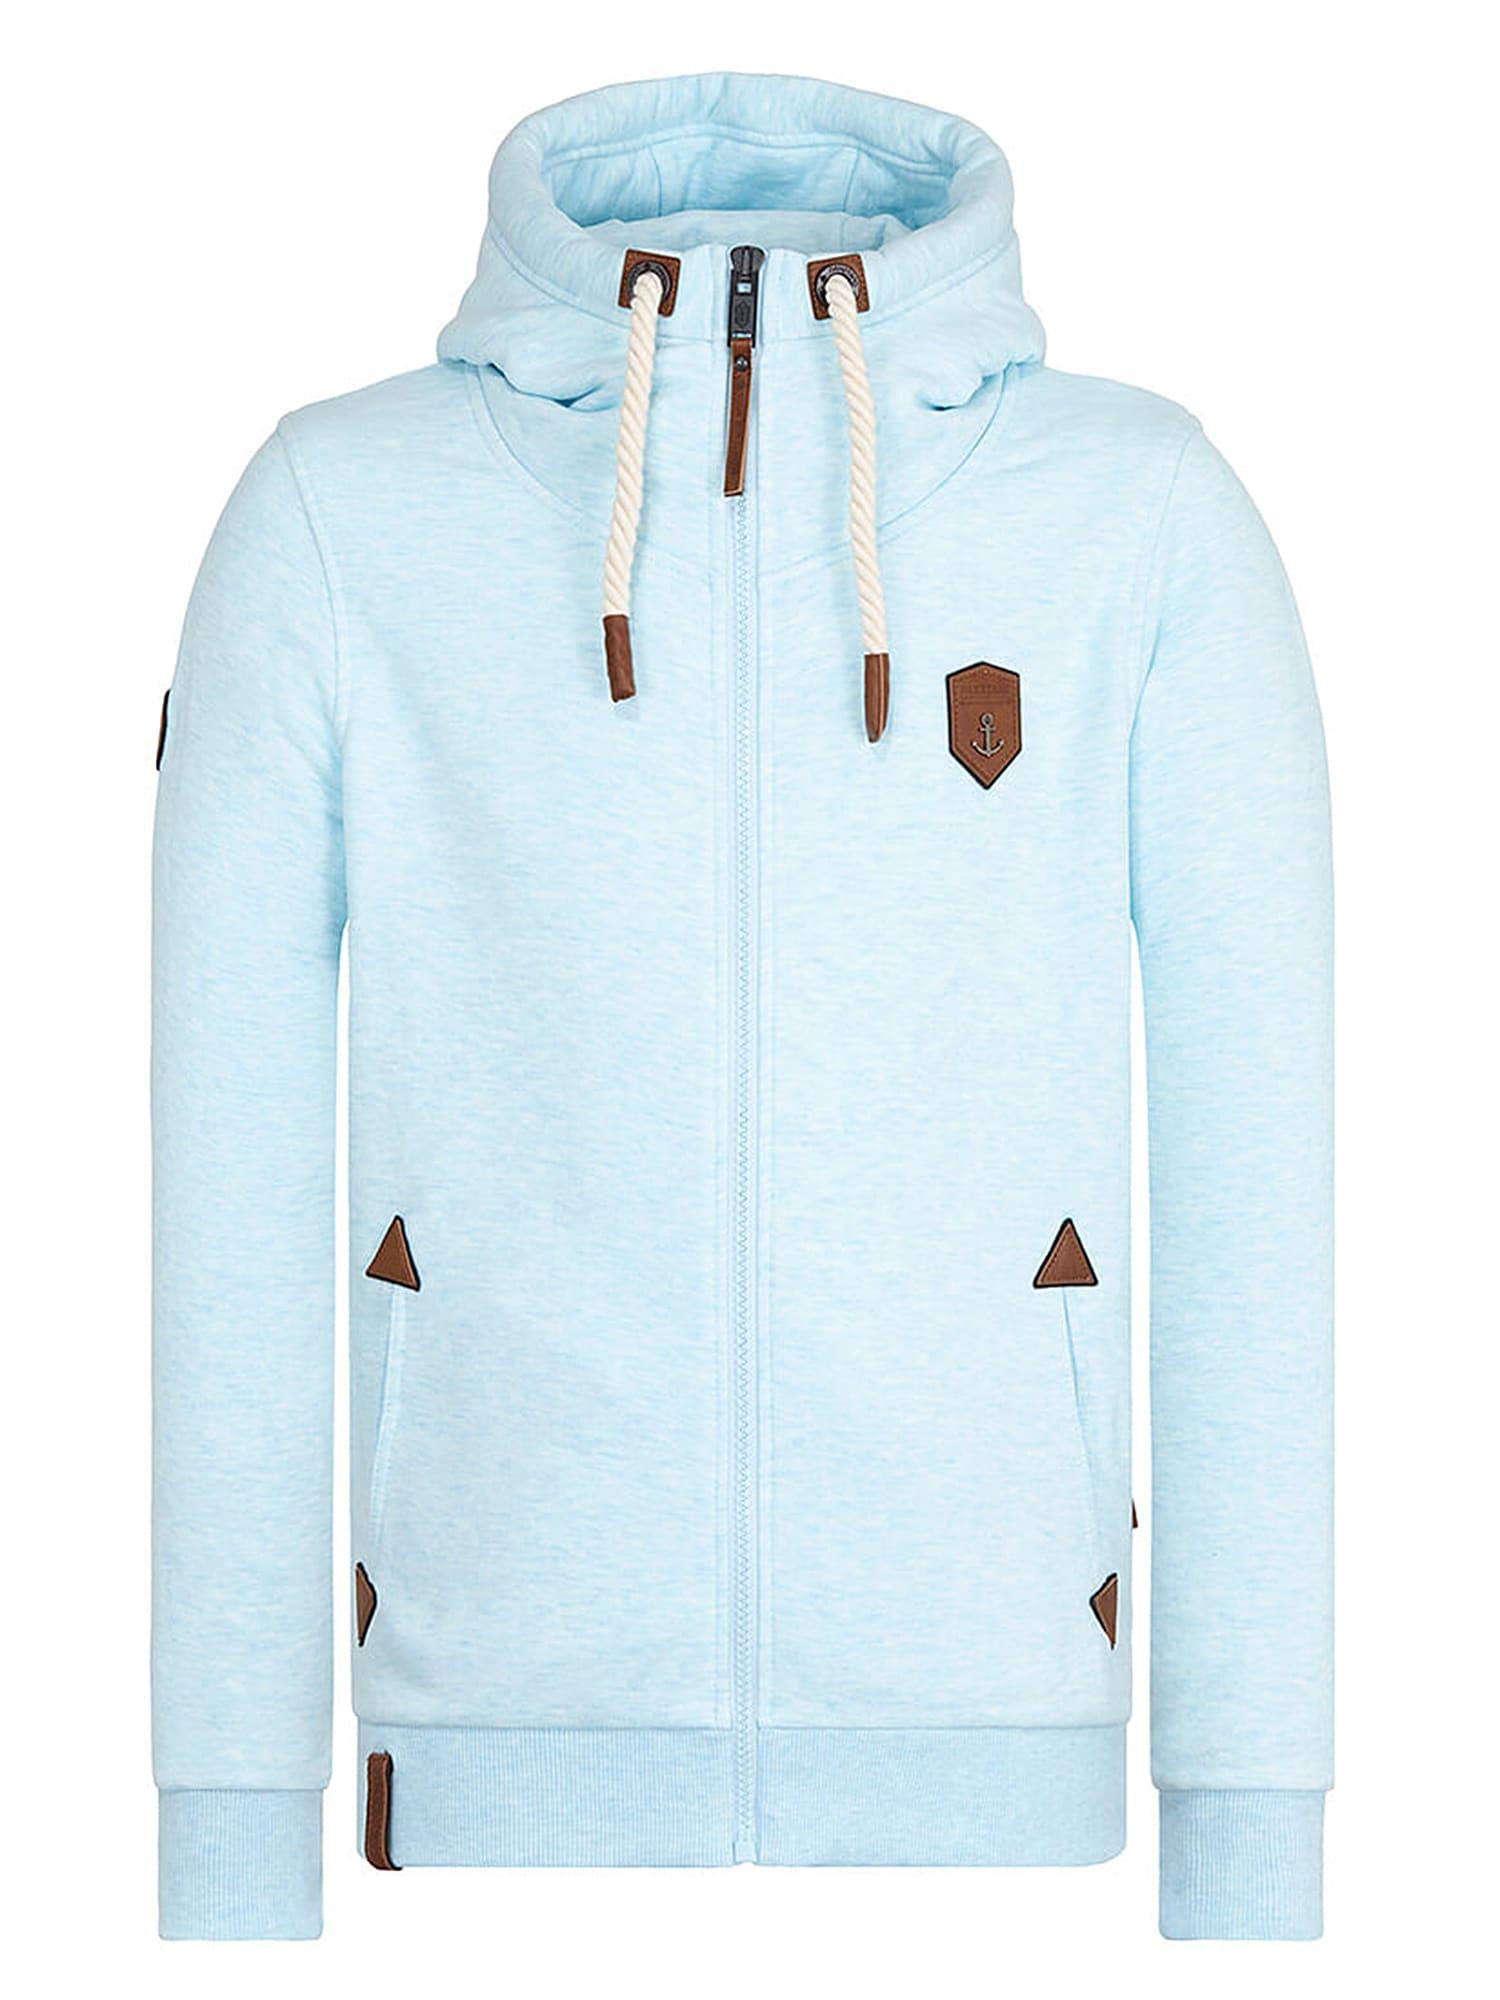 Mikina s kapucí aqua modrá Naketano